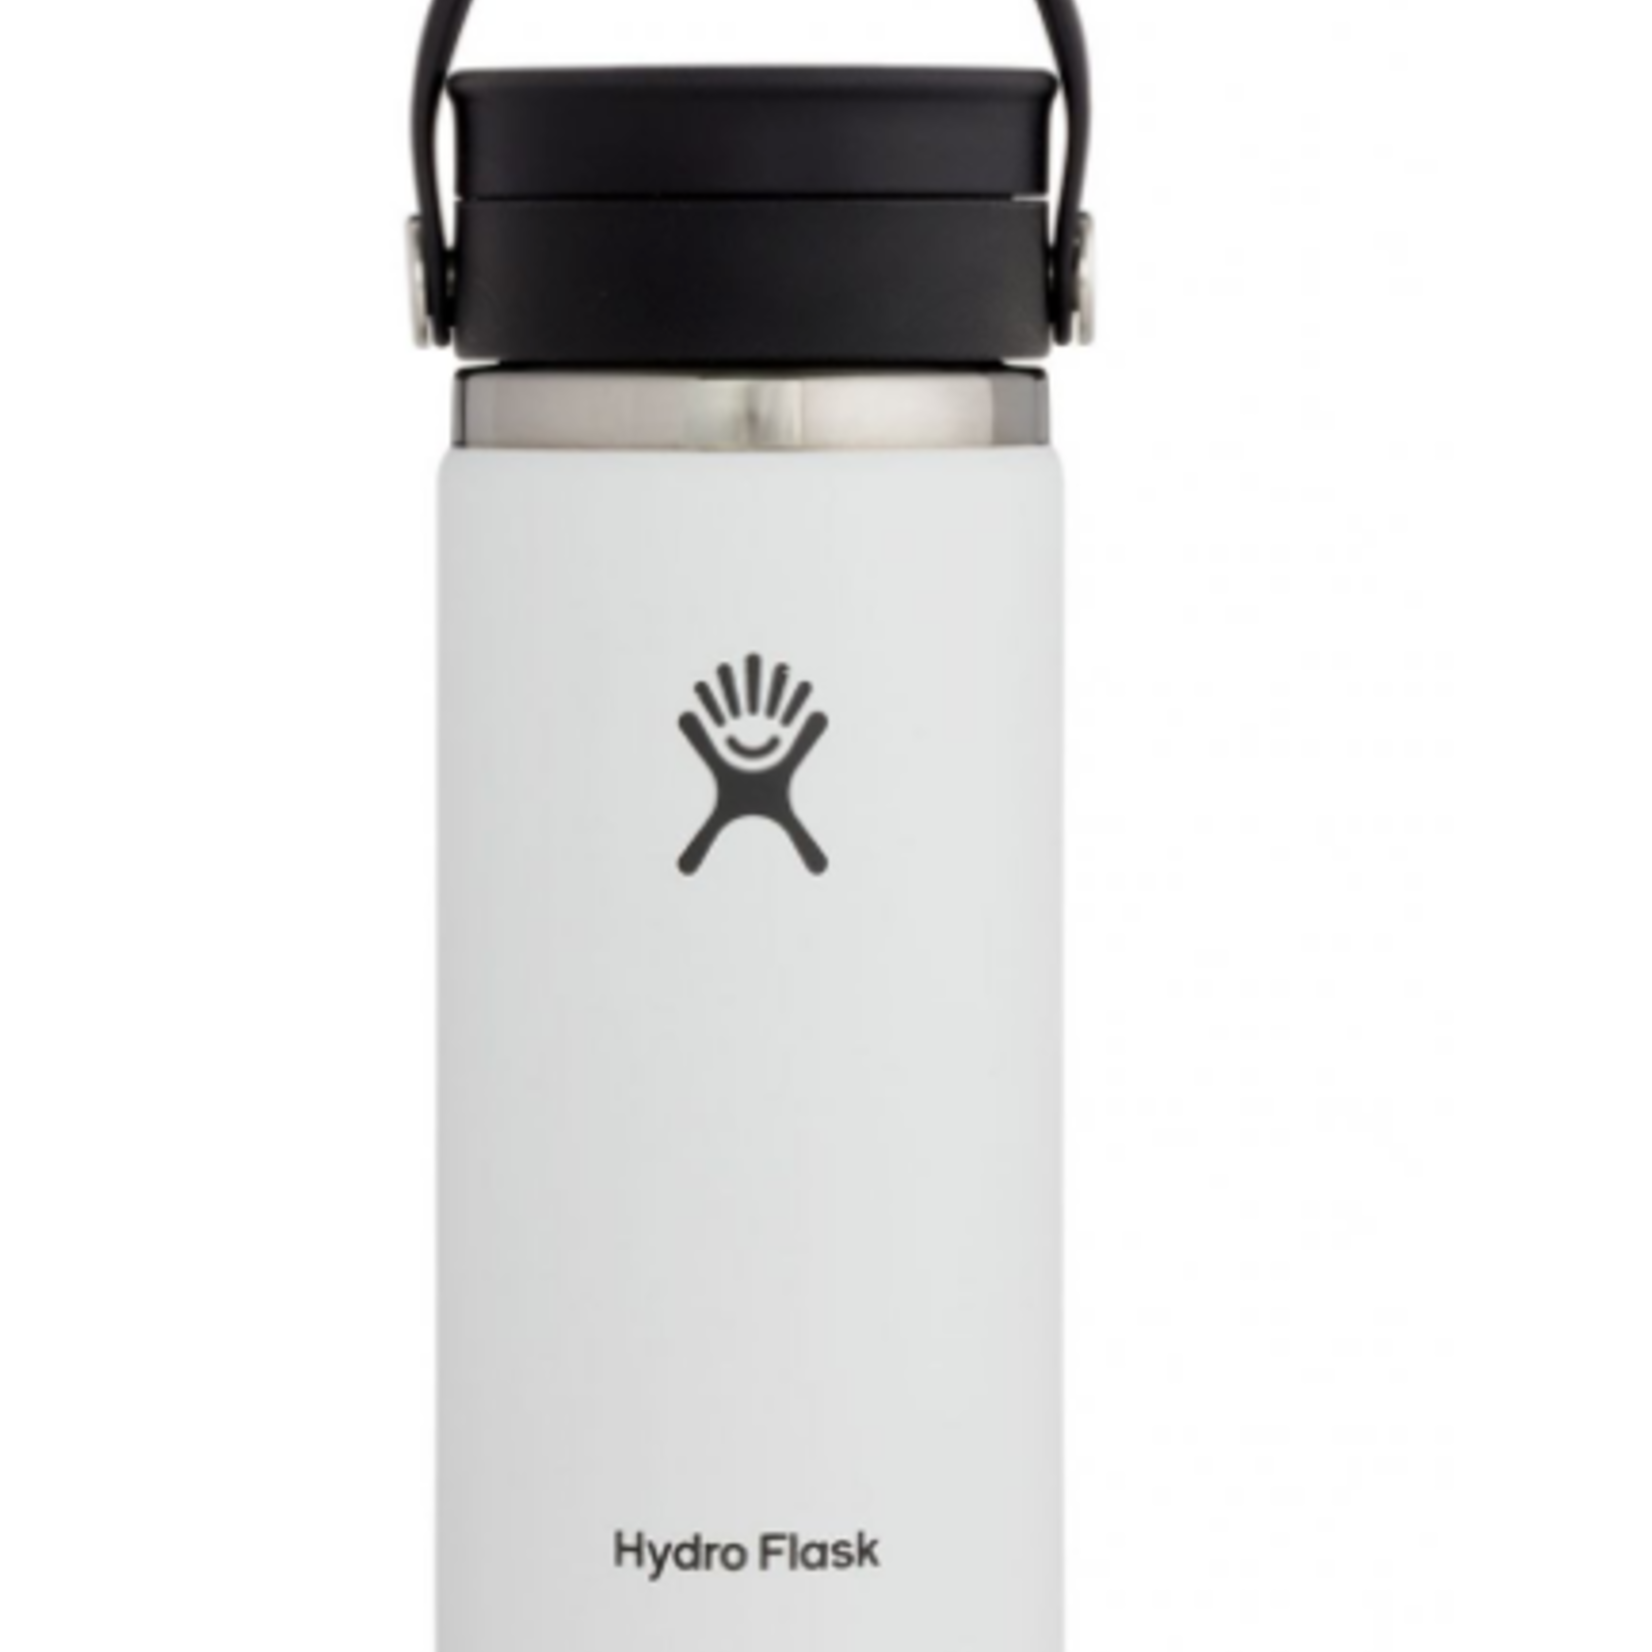 Hydro Flask Hydro Flask 16 oz Coffee Wide-Mouth Flex Sip Lid